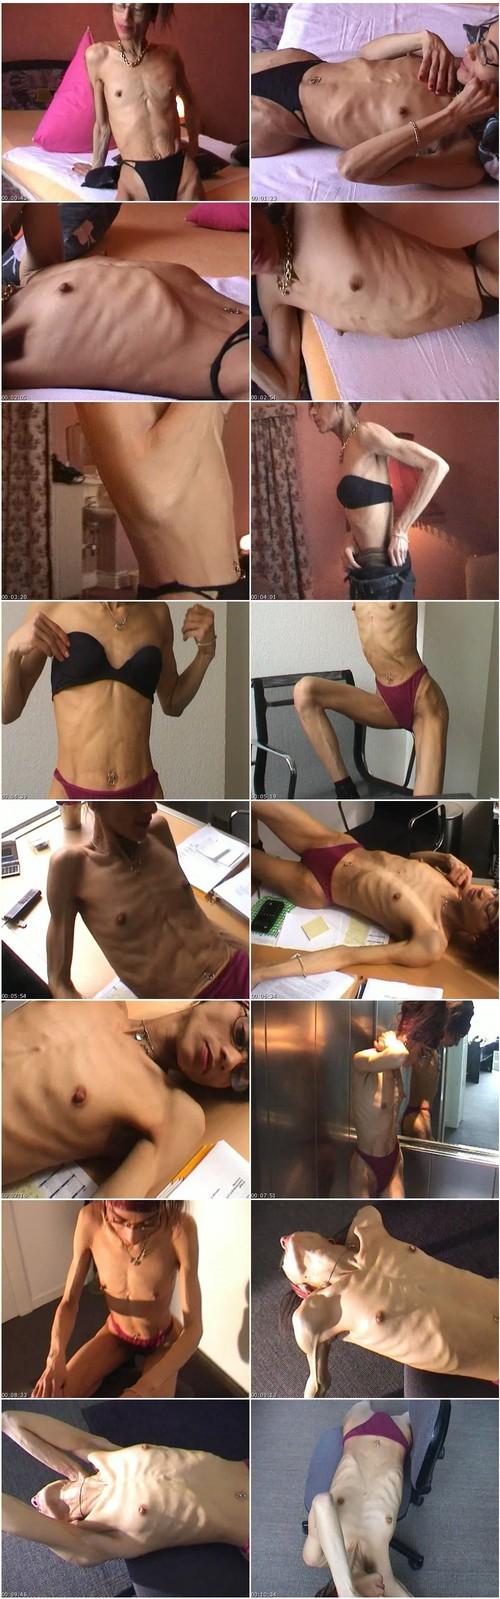 http://ist5-1.filesor.com/pimpandhost.com/9/6/8/3/96838/6/g/4/S/6g4S6/Anorexia-b179_thumb_m.jpg